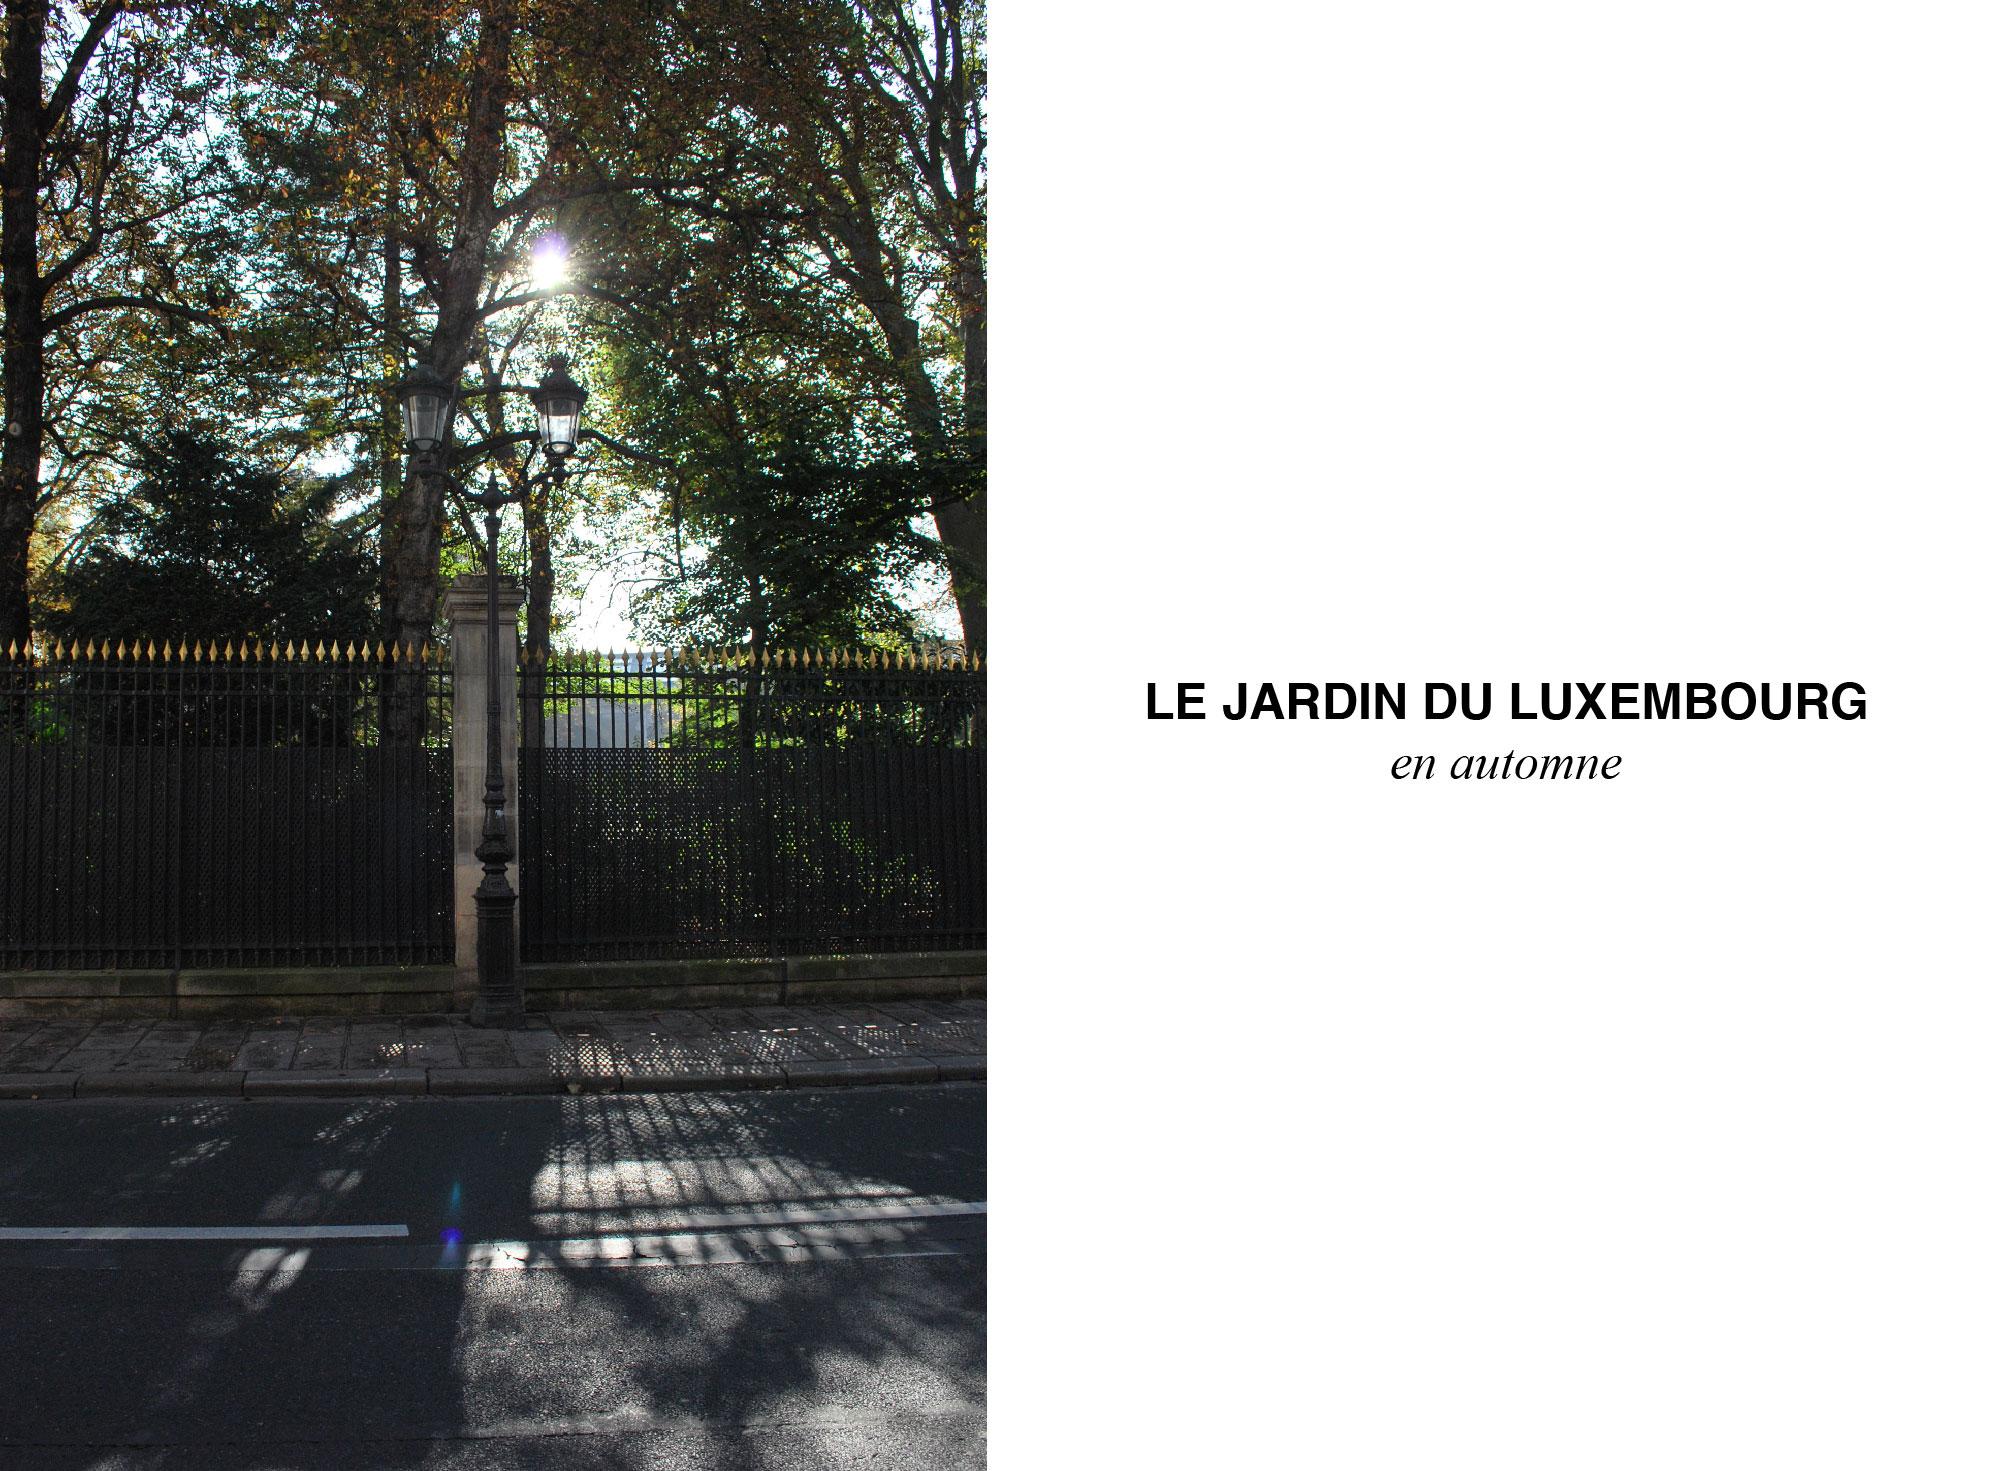 paris-luxembourg-automne-01